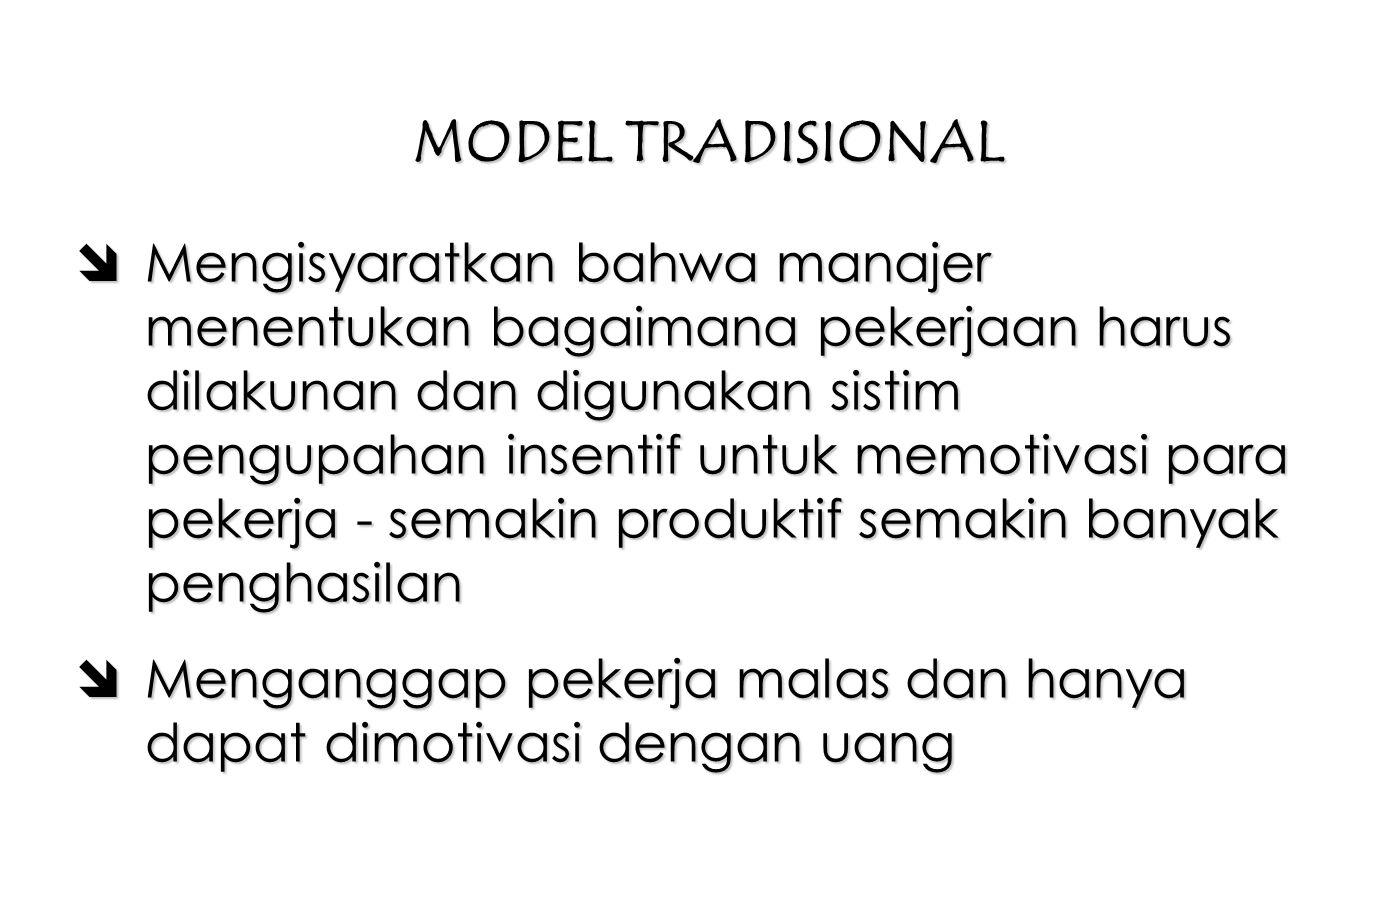 MODEL TRADISIONAL